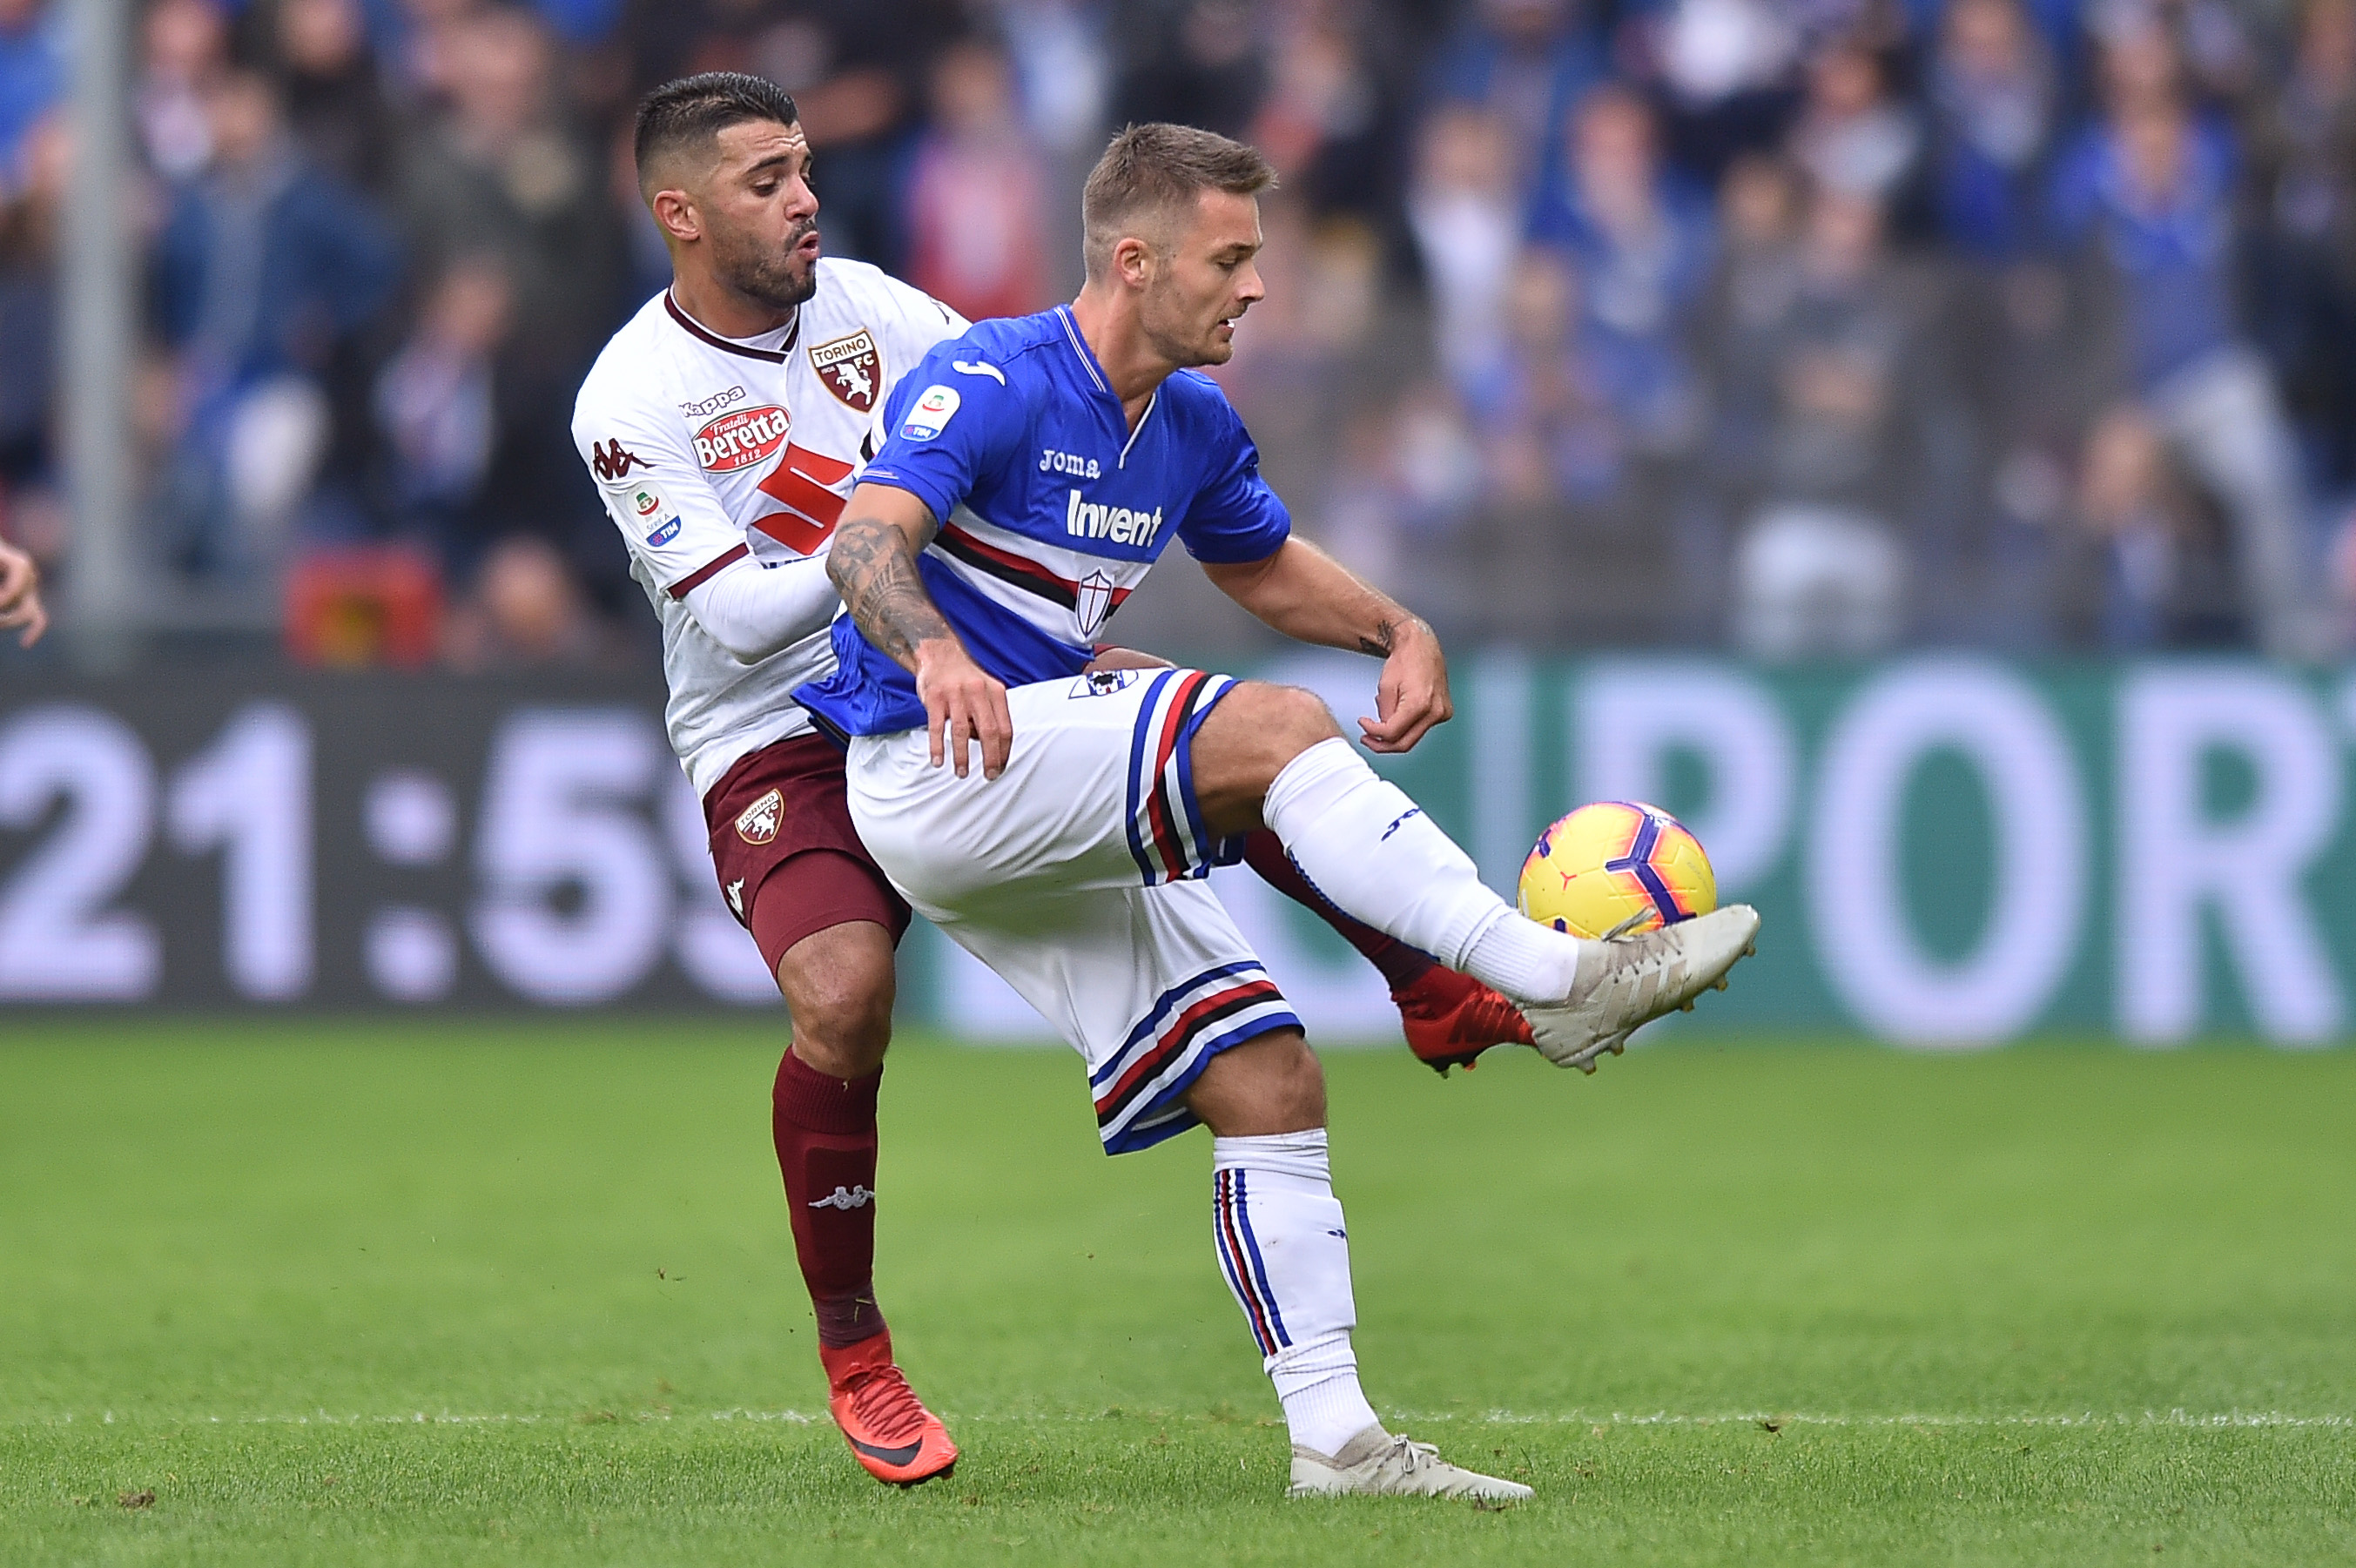 04.11.2018, Genua, Serie A 2018/2019, Sampdoria Genua - Torino FC N/z: Karol Linetty, Foto Lukasz Laskowski / PressFocus